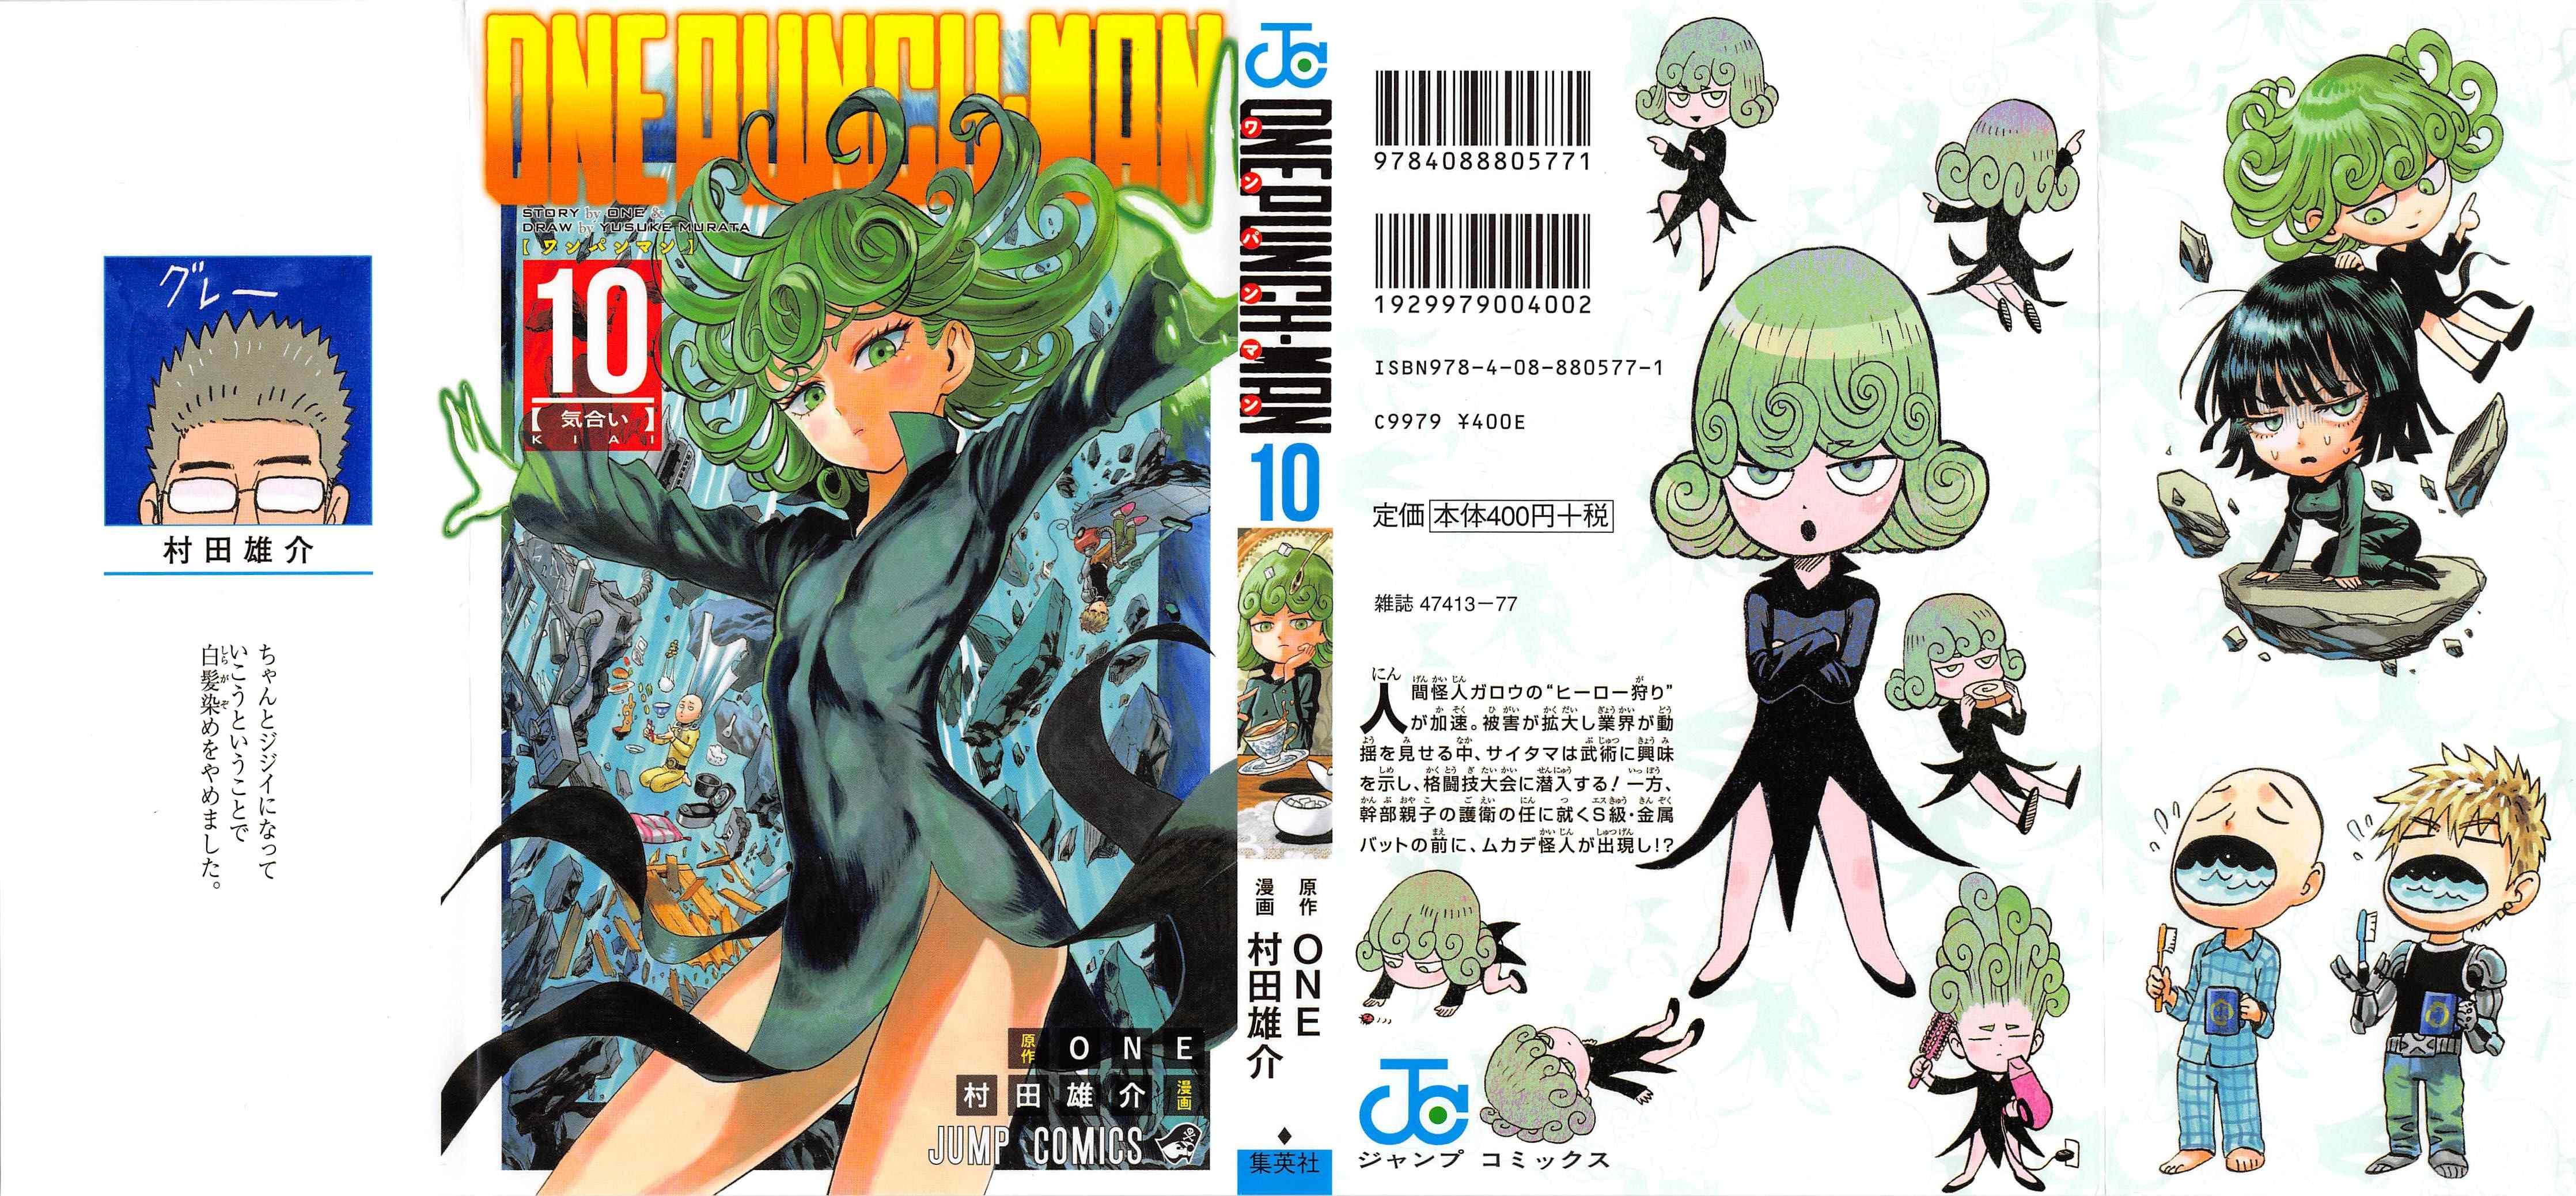 Wallpaper One Punch Man Yusuke Murata Tornado Anime Girls